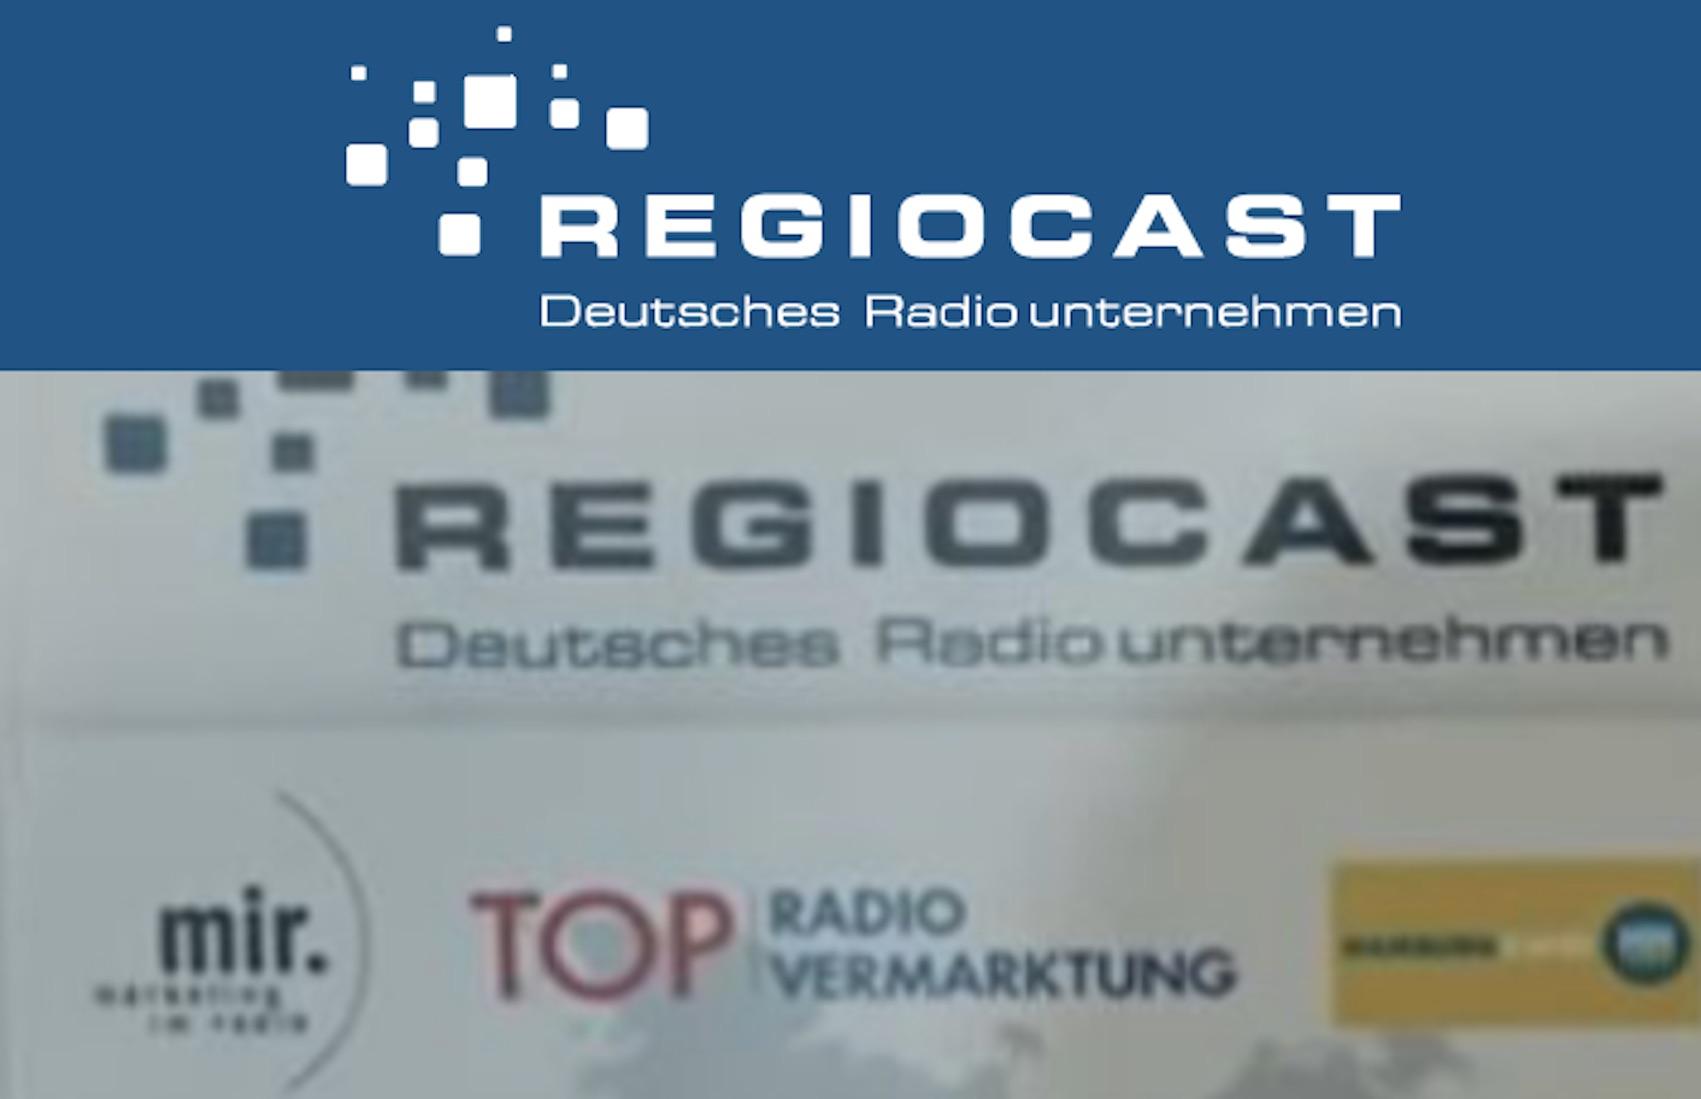 Aussetzer bei Regiocast-Streams (Quelle: regiocast.de, Screenshot: SmartPhoneFan.de)